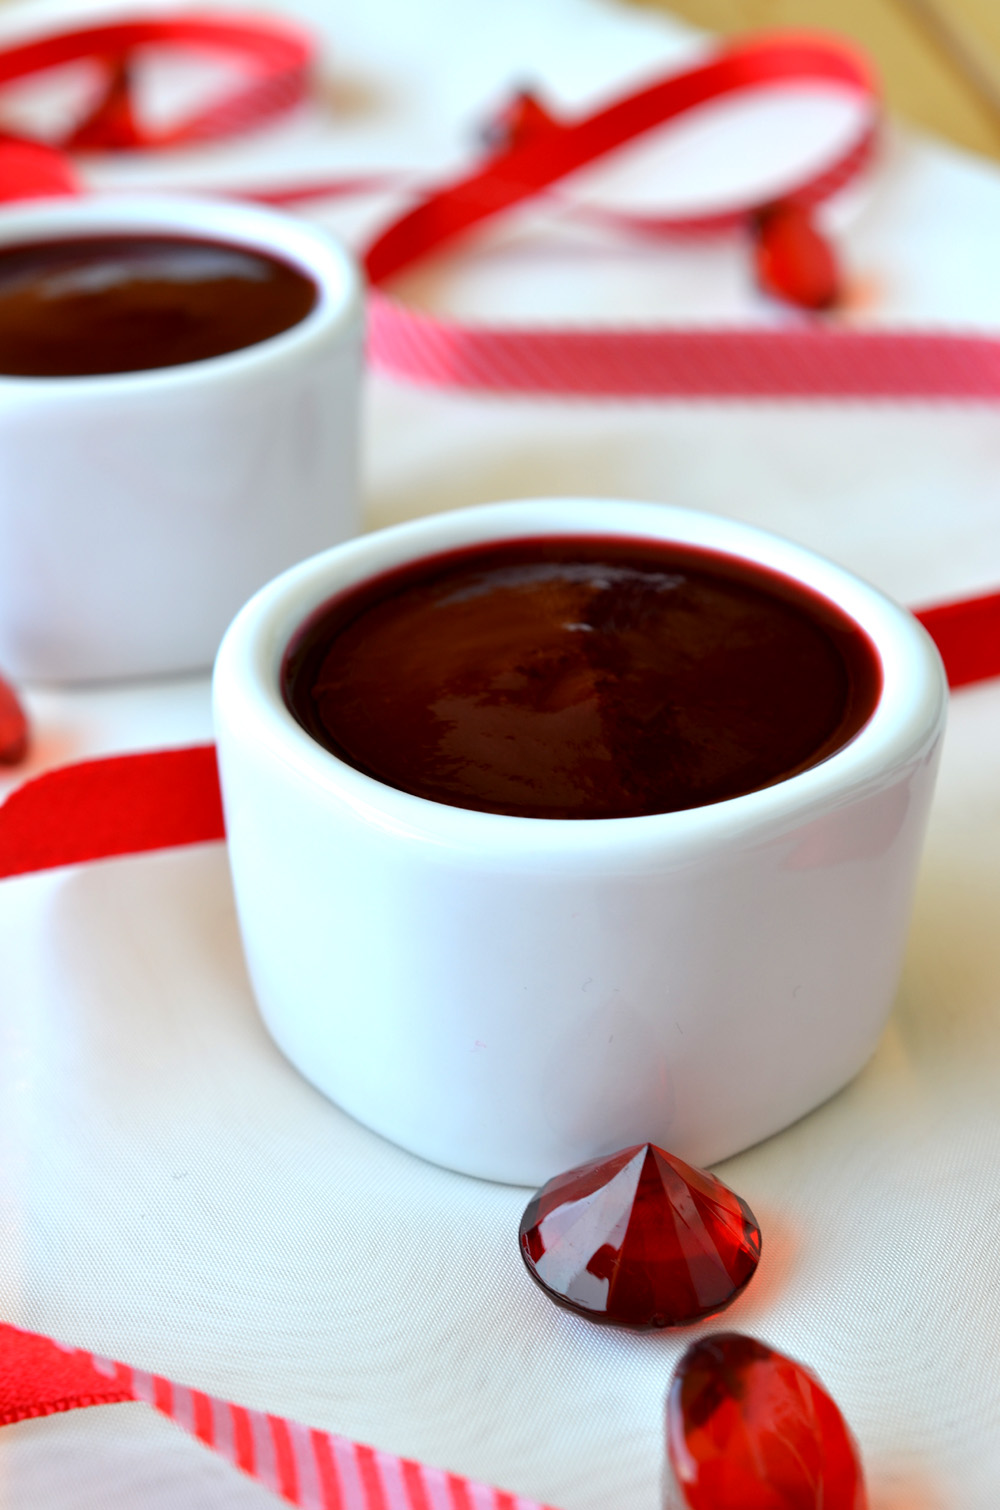 Ninas kleiner food blog: himbeer brombeer tomaten ketchup